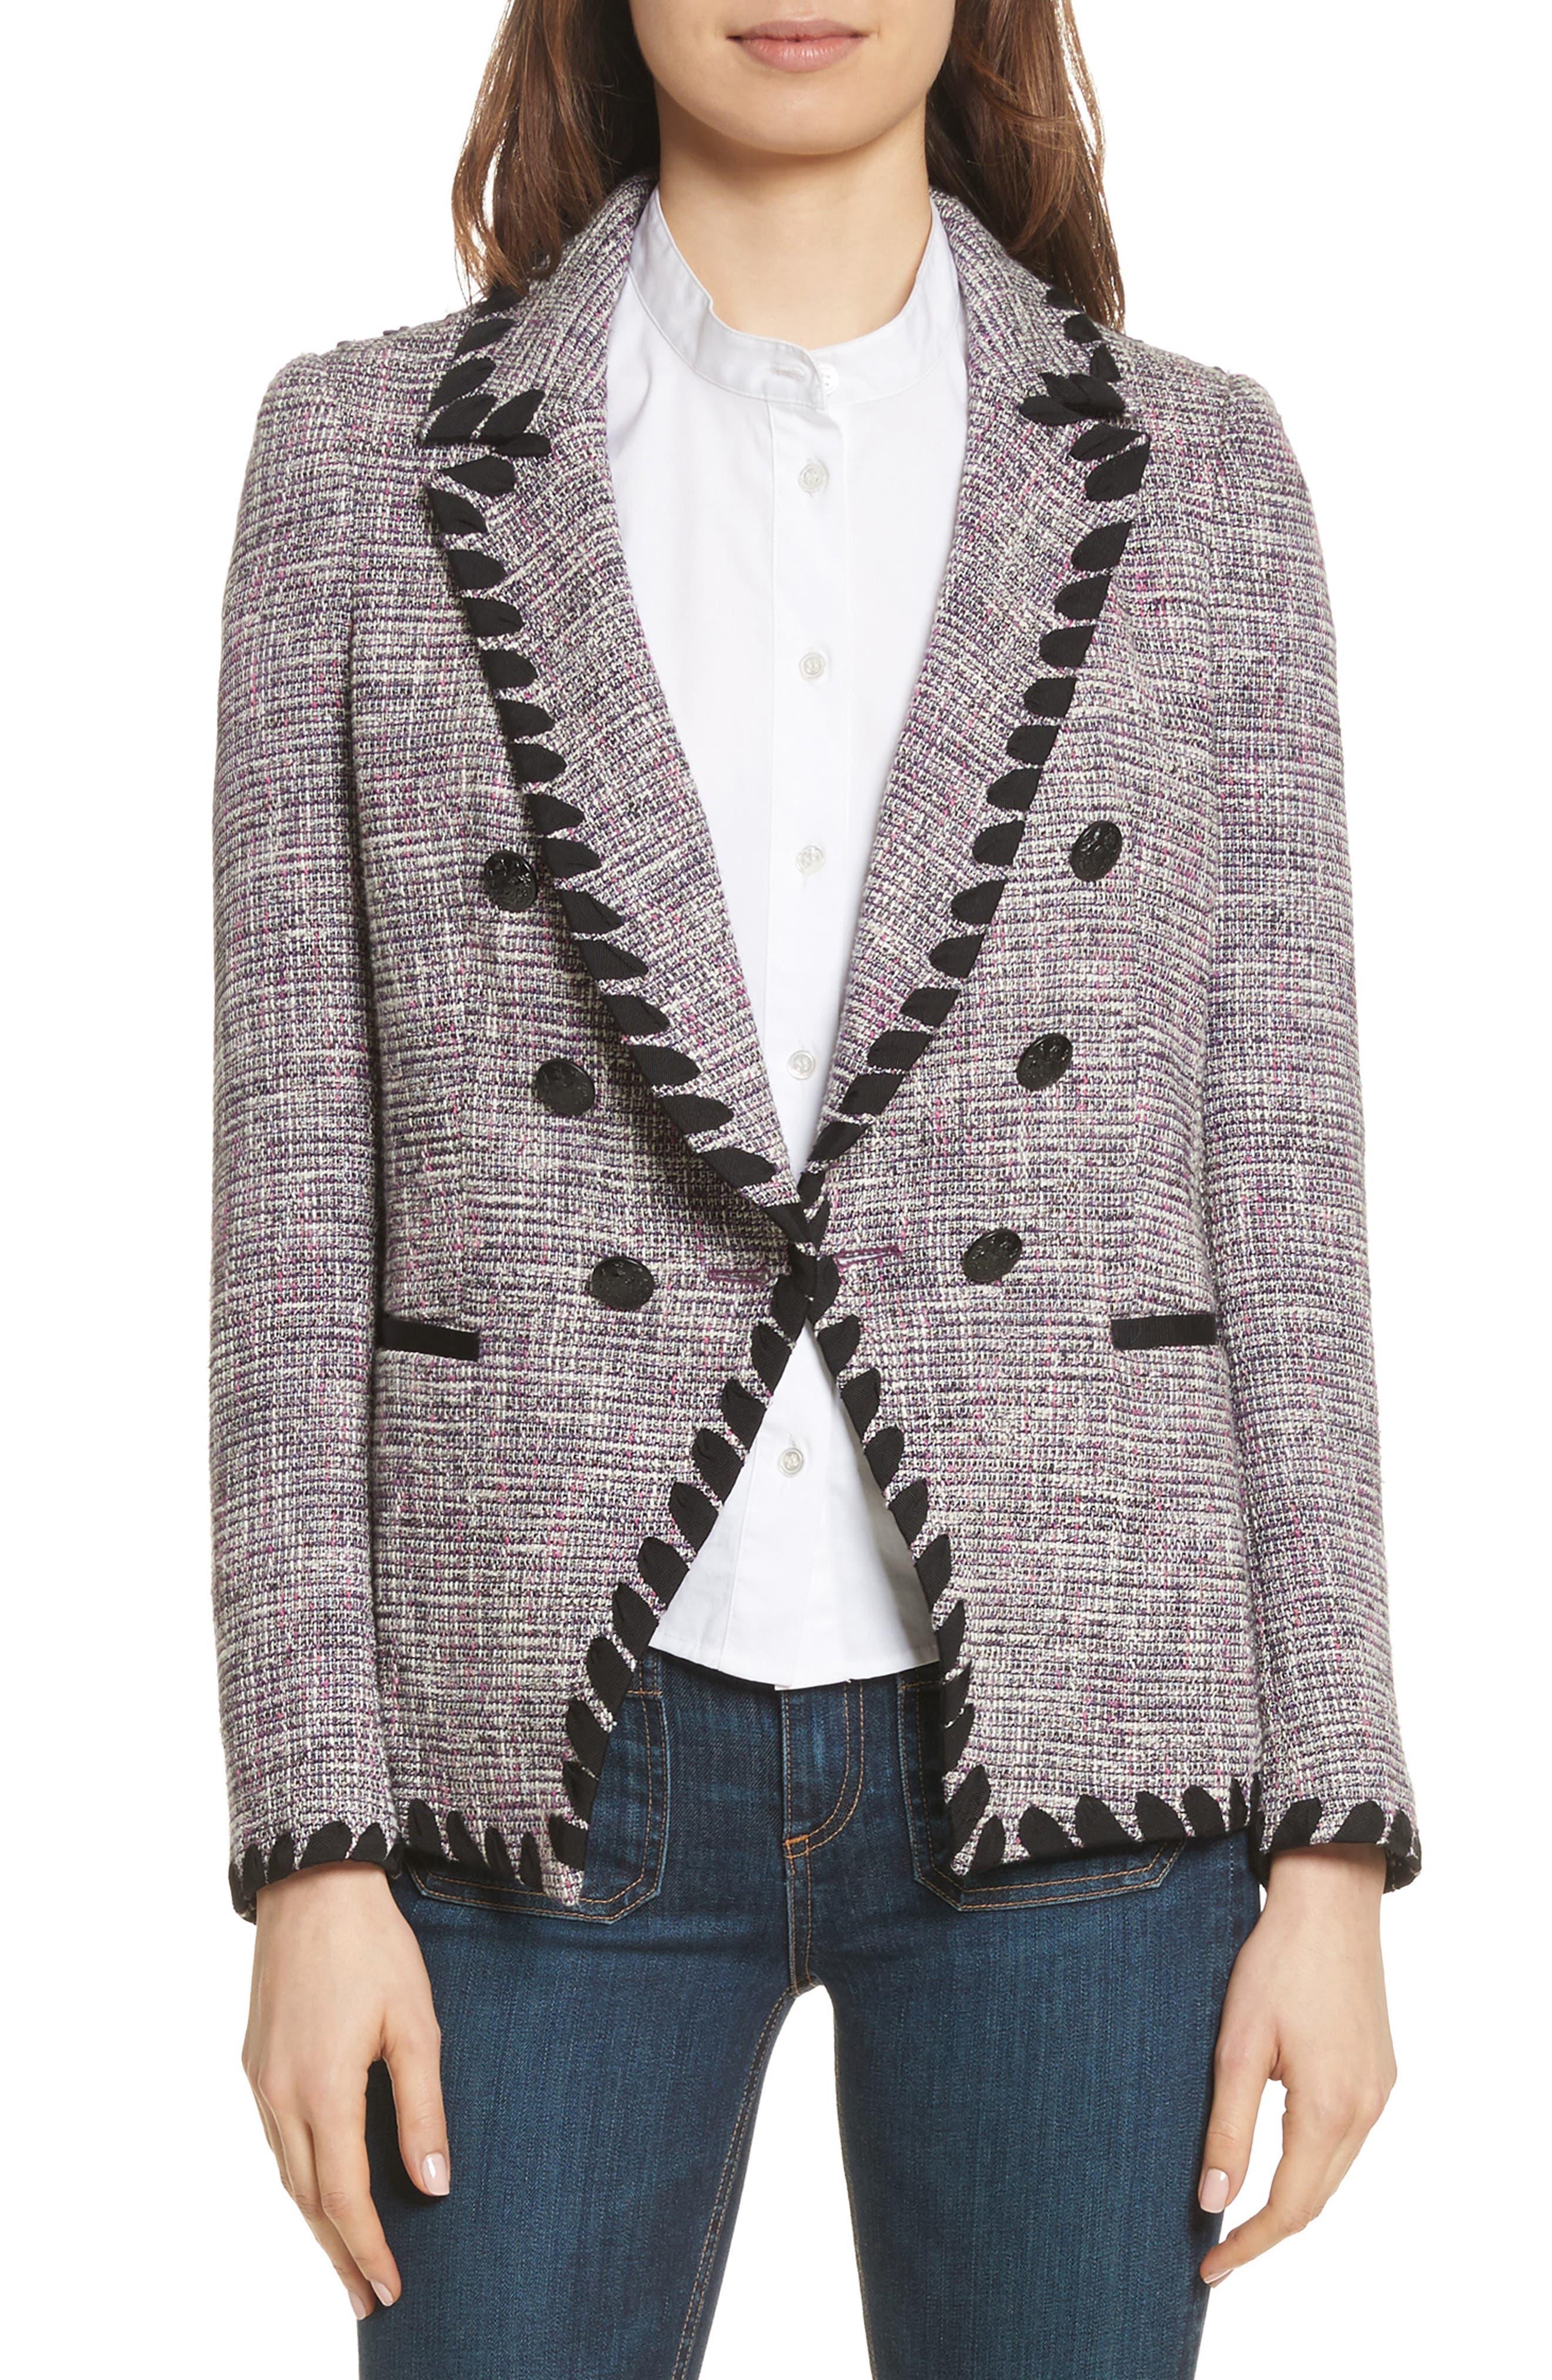 Octivia Tweed Blazer,                             Main thumbnail 1, color,                             Pink/ Black/ White